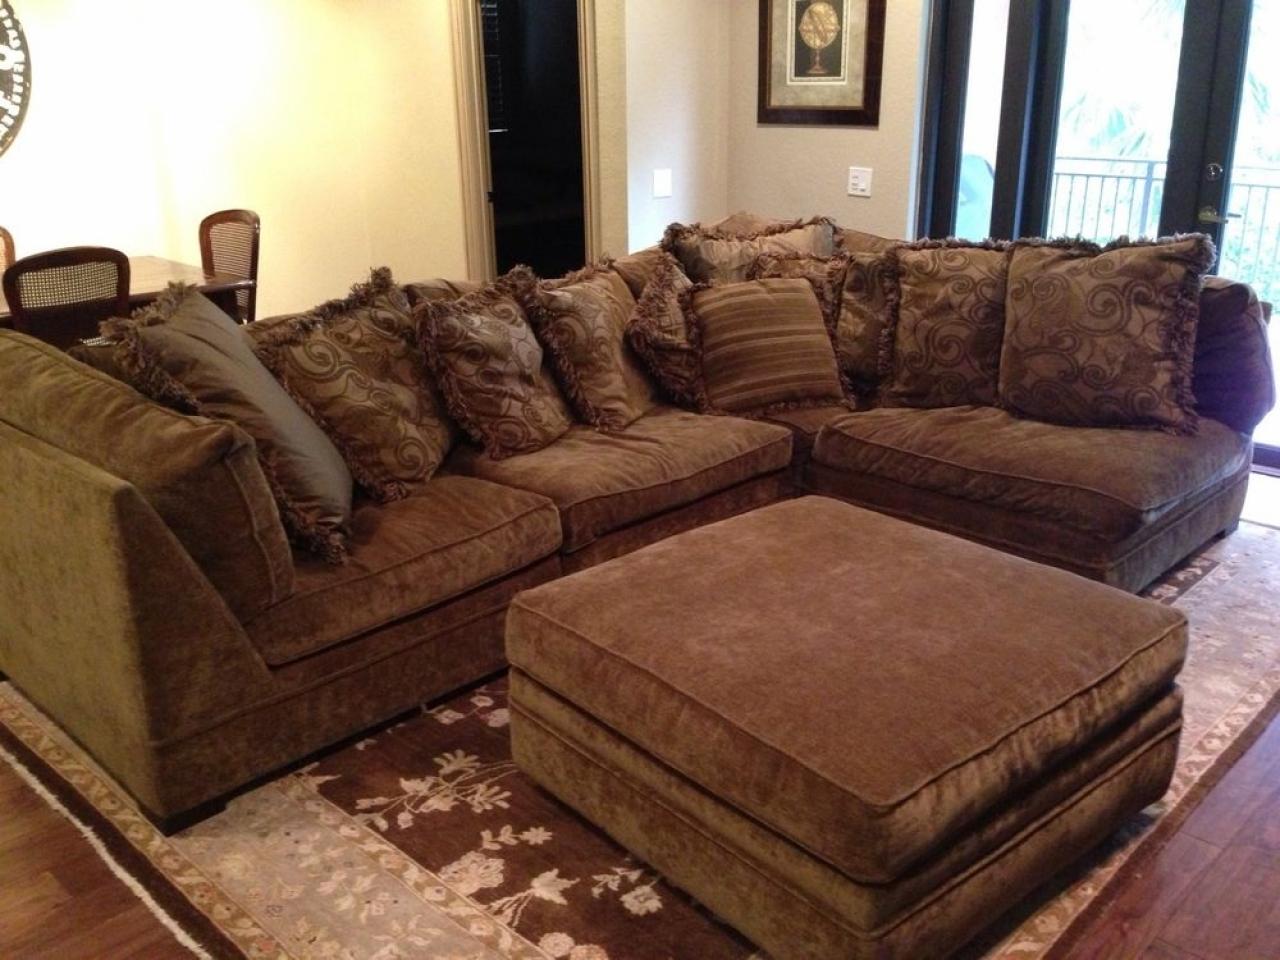 Down Sectional Sofa | Blackfridays (Image 3 of 10)